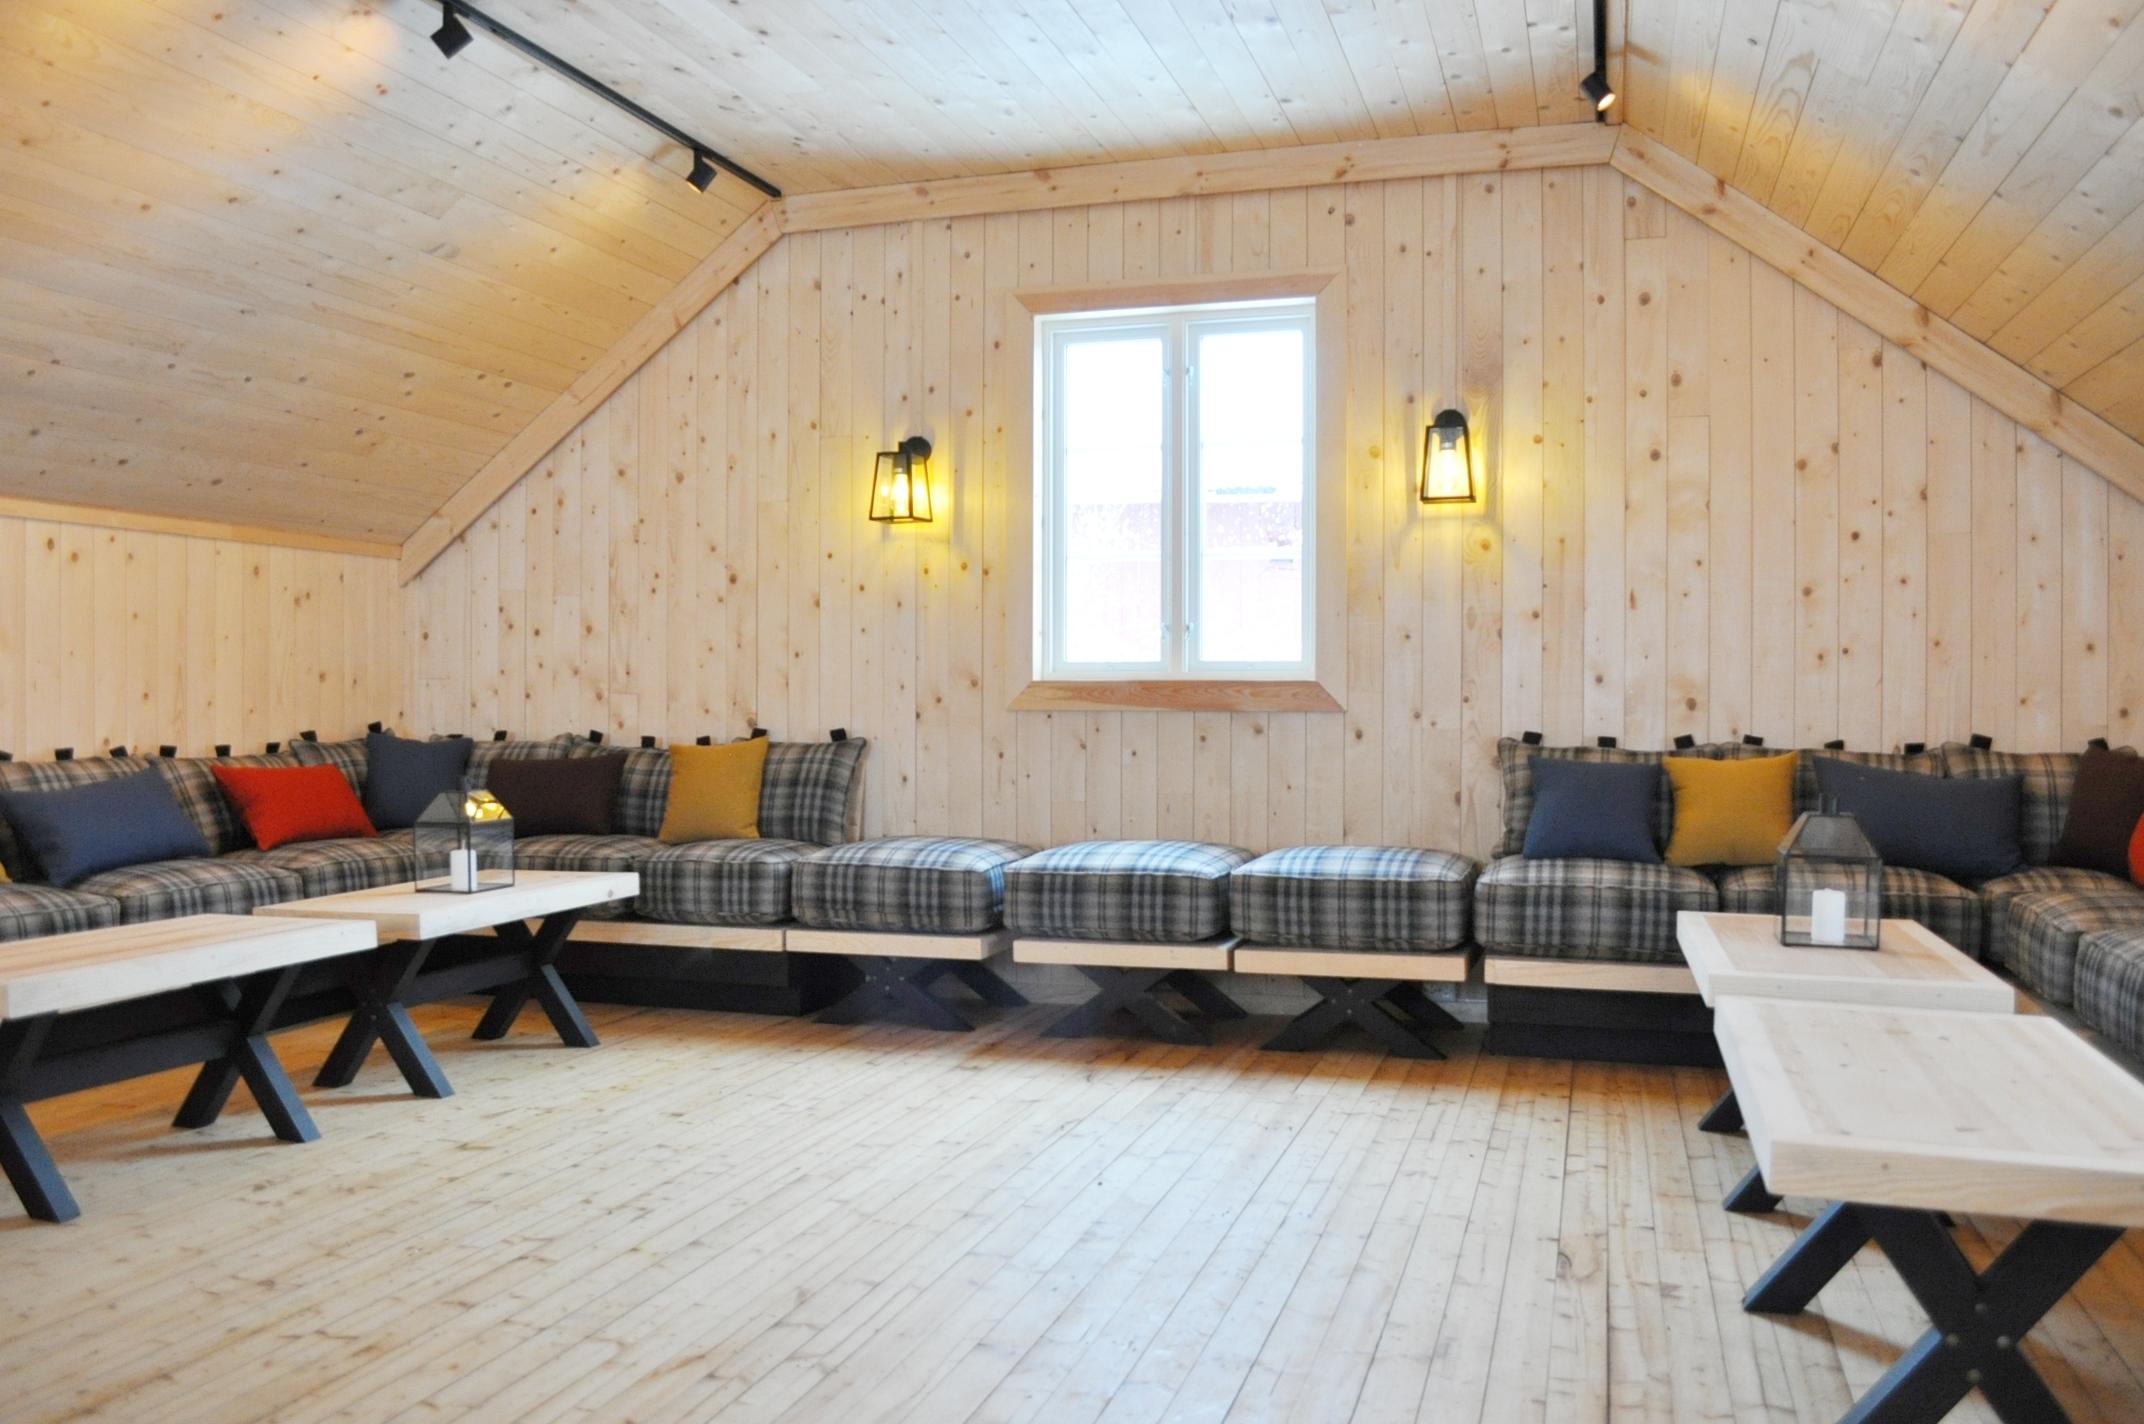 Allrom helhetsbilde sitteplass sofa interiørarkitektur oslo.jpg